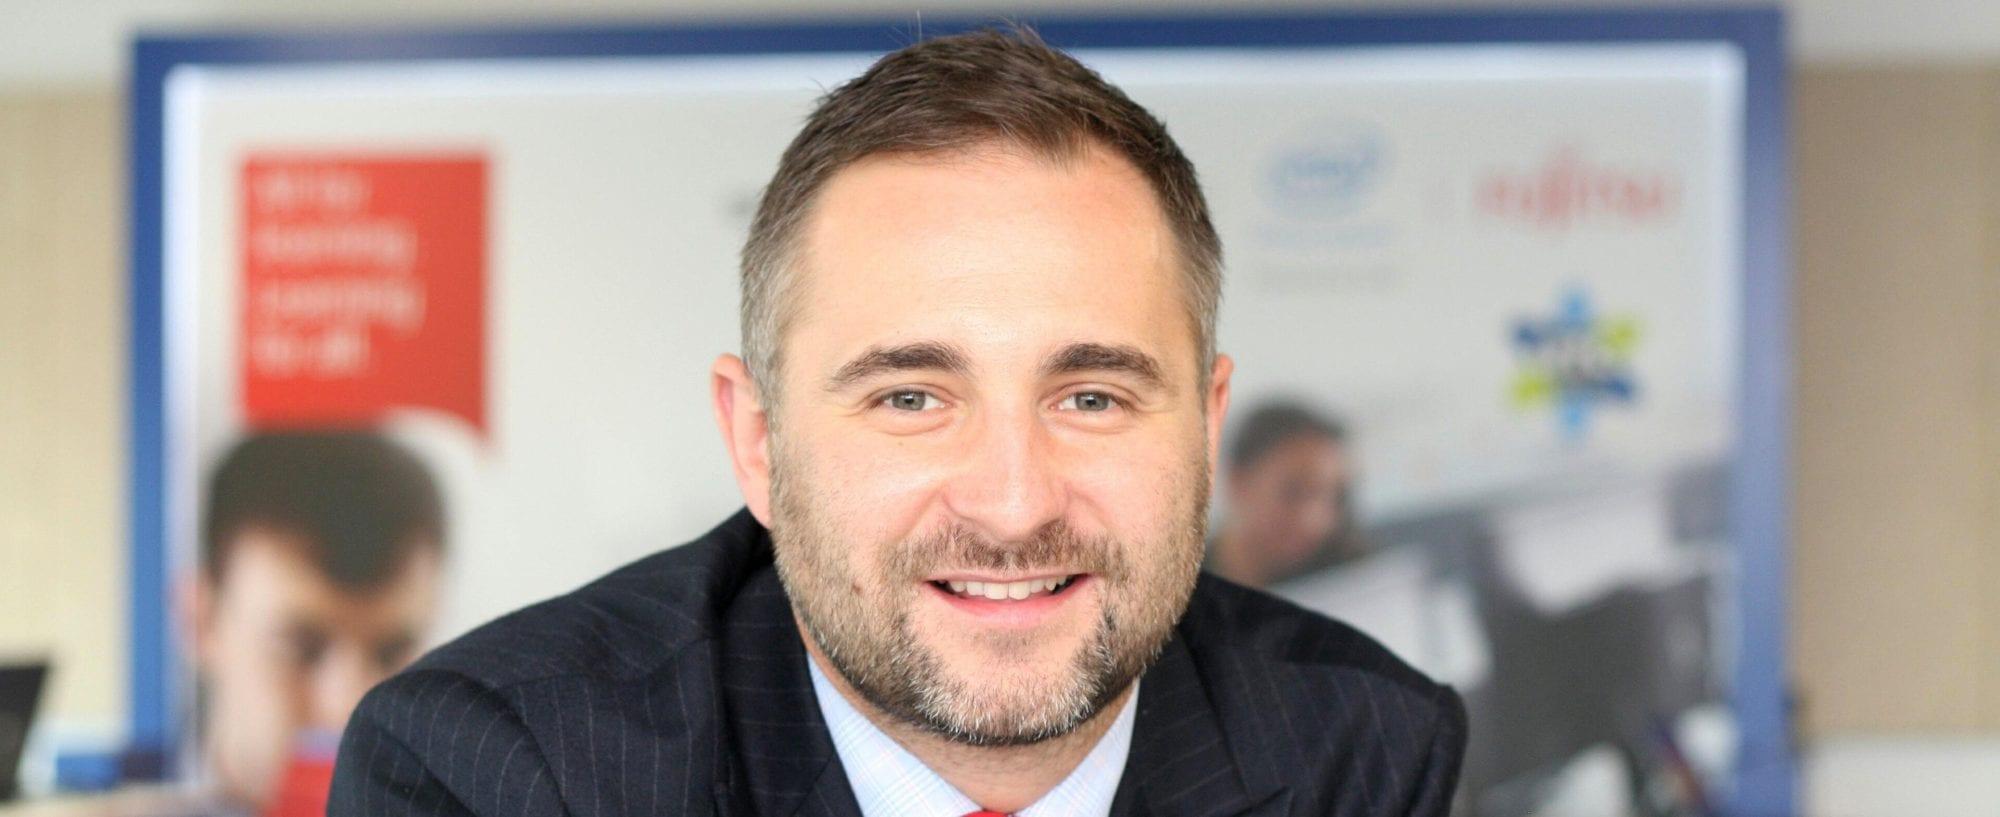 UTC Principal to support Northwich school